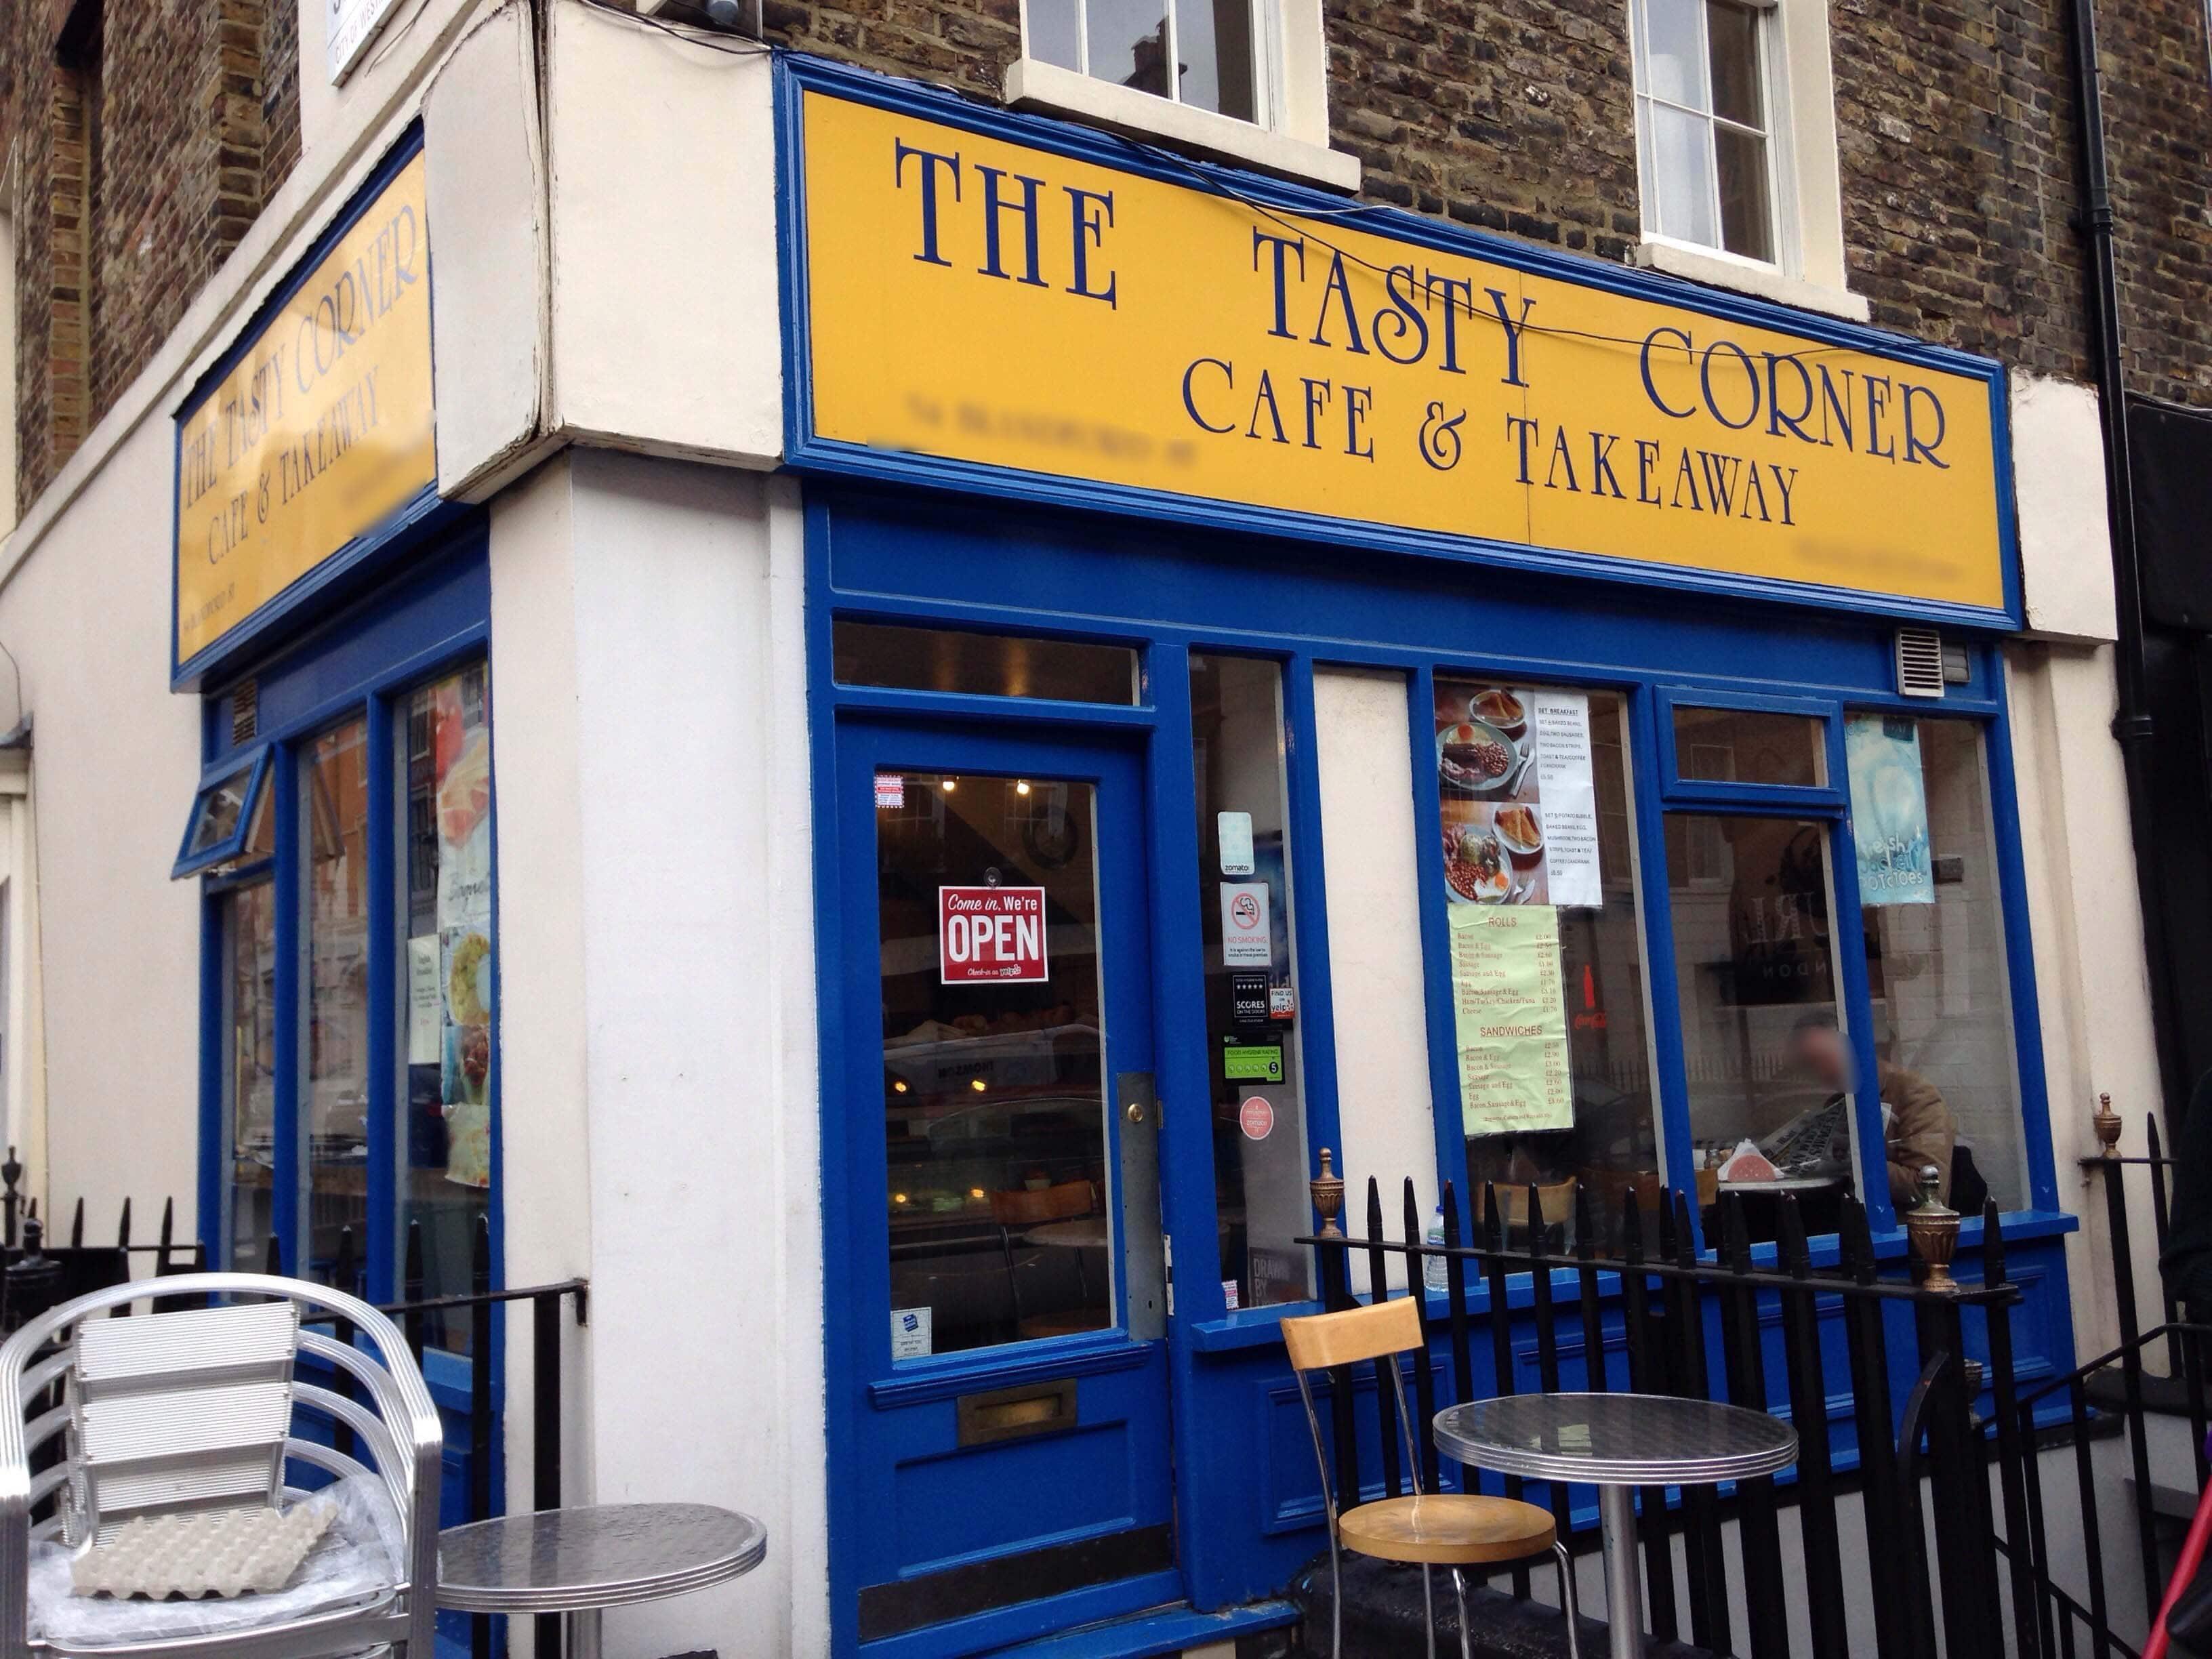 Tasty Corner Menu, Menu for Tasty Corner, Marylebone, London